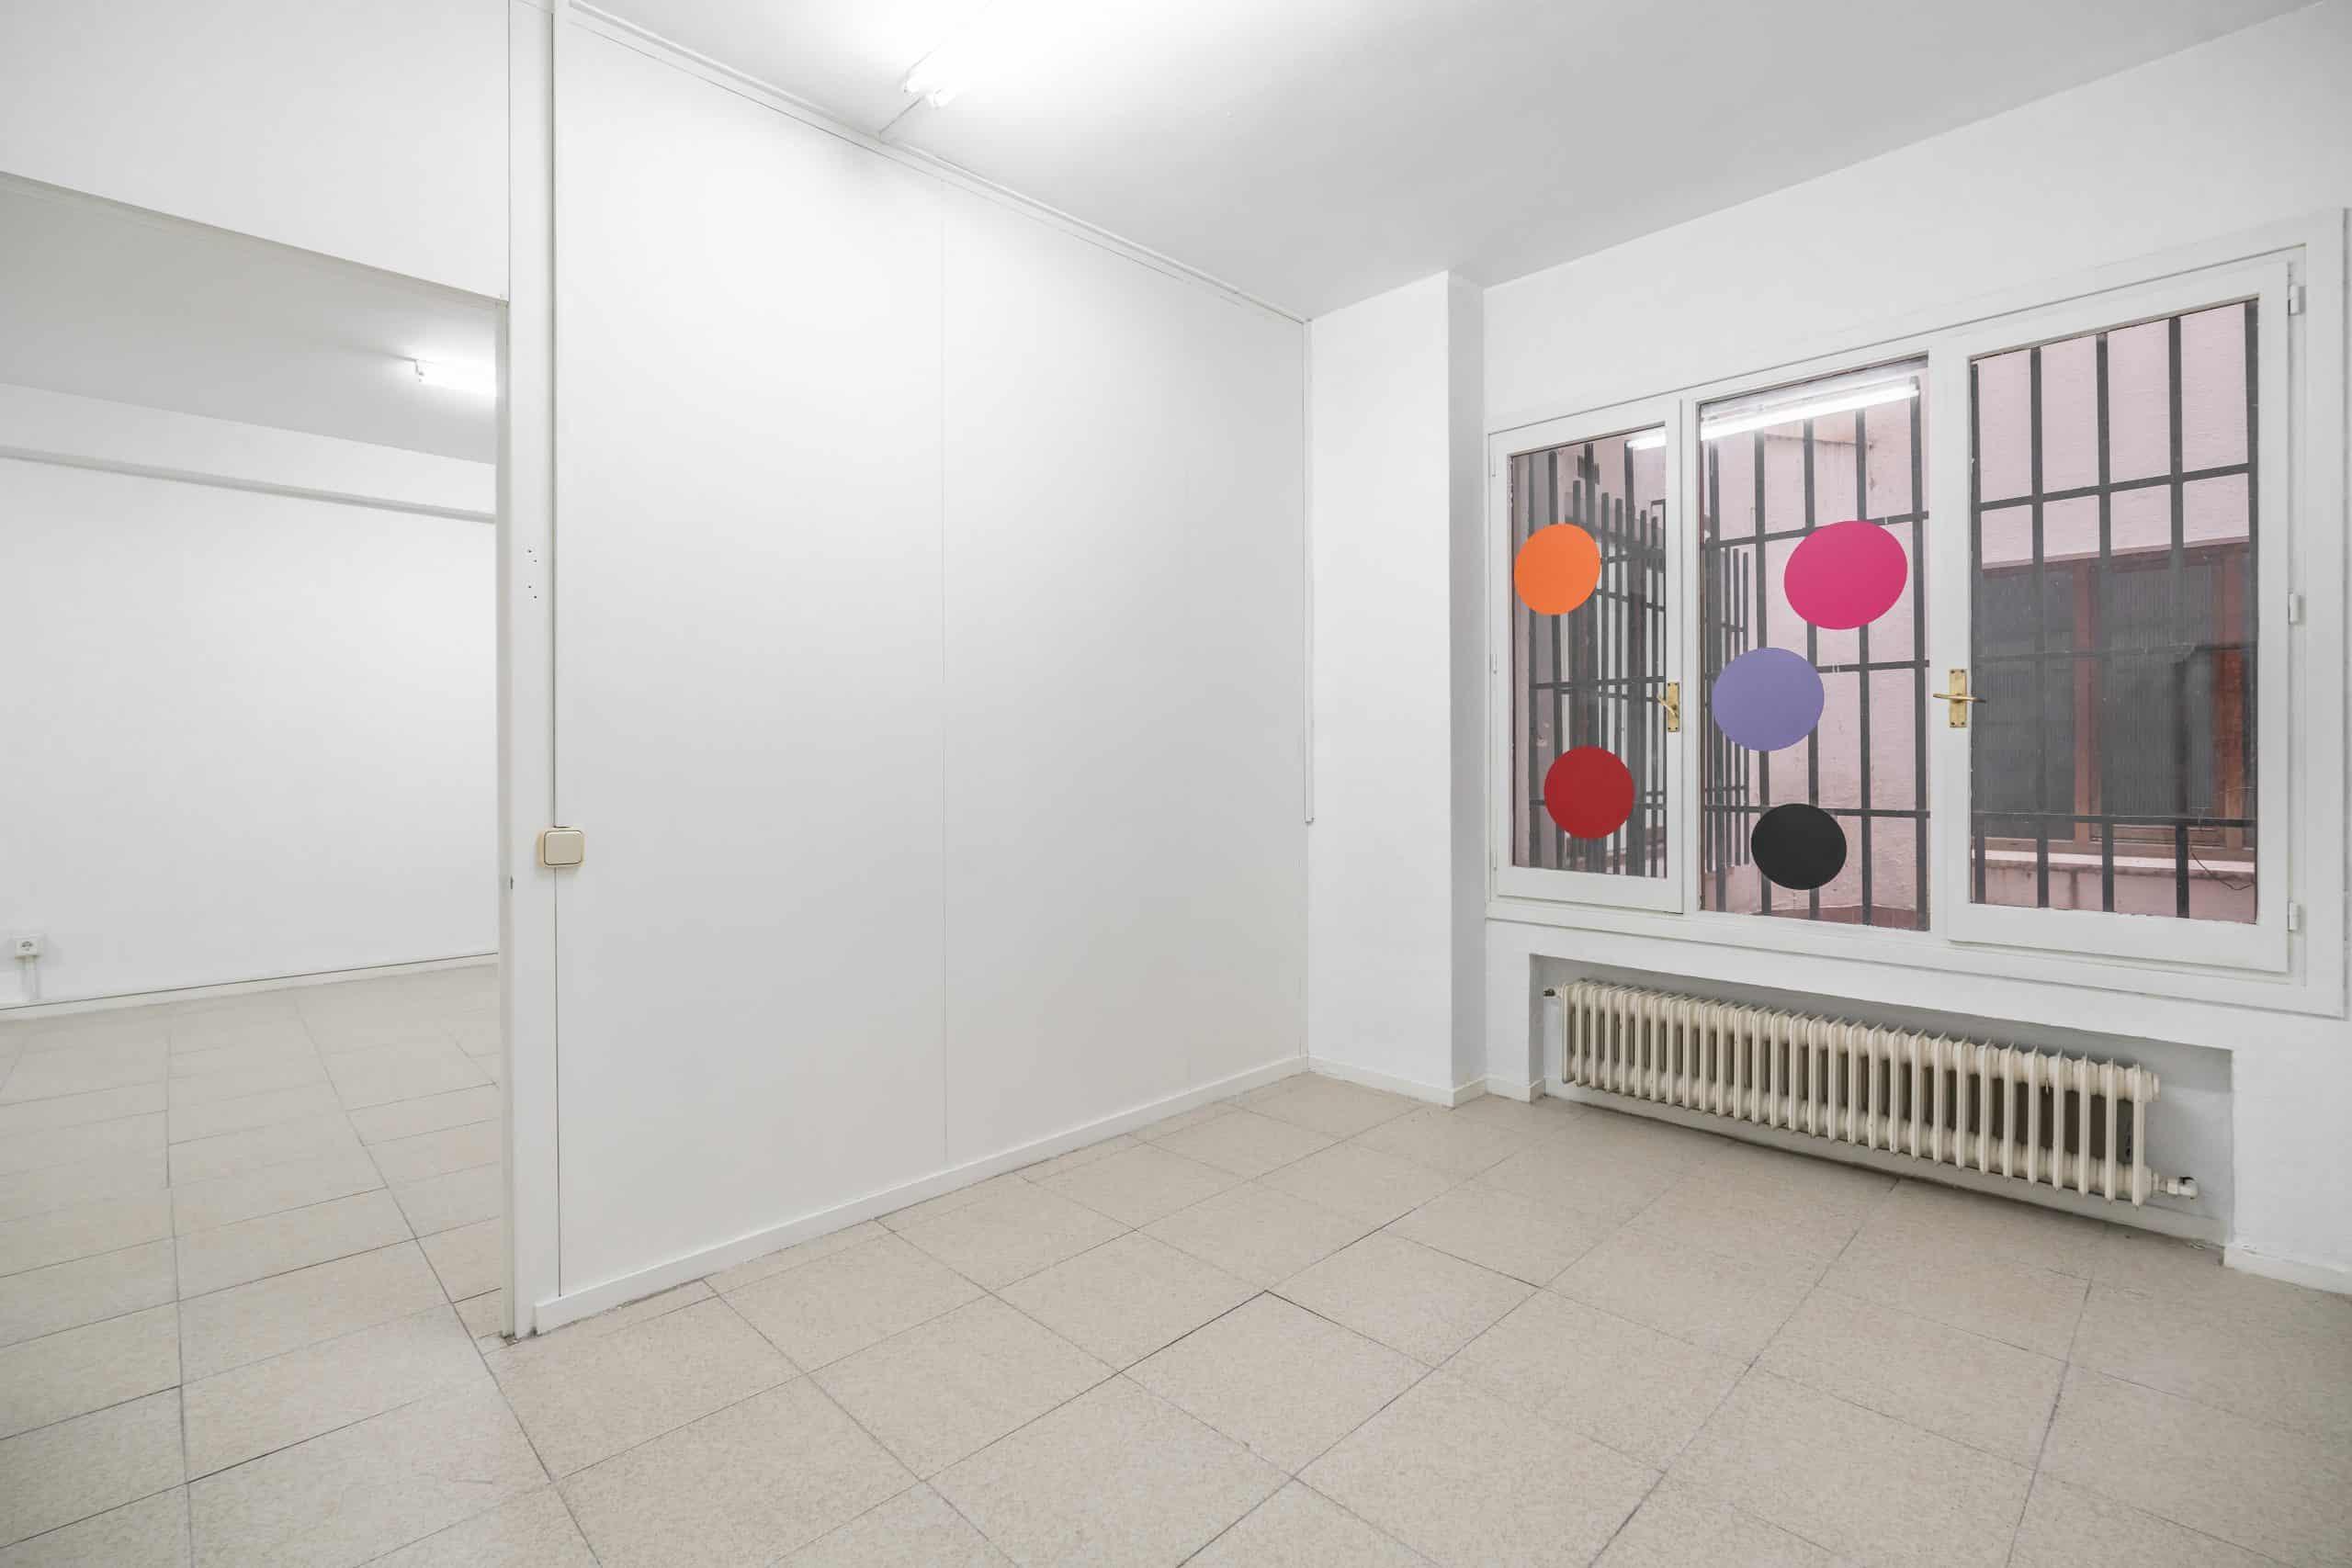 Agencia Inmobiliaria de Madrid-FUTUROCASA-Zona ARGANZUELA-LEGAZPI -calle Modesto Lafuente 41,1ºC estancia 1